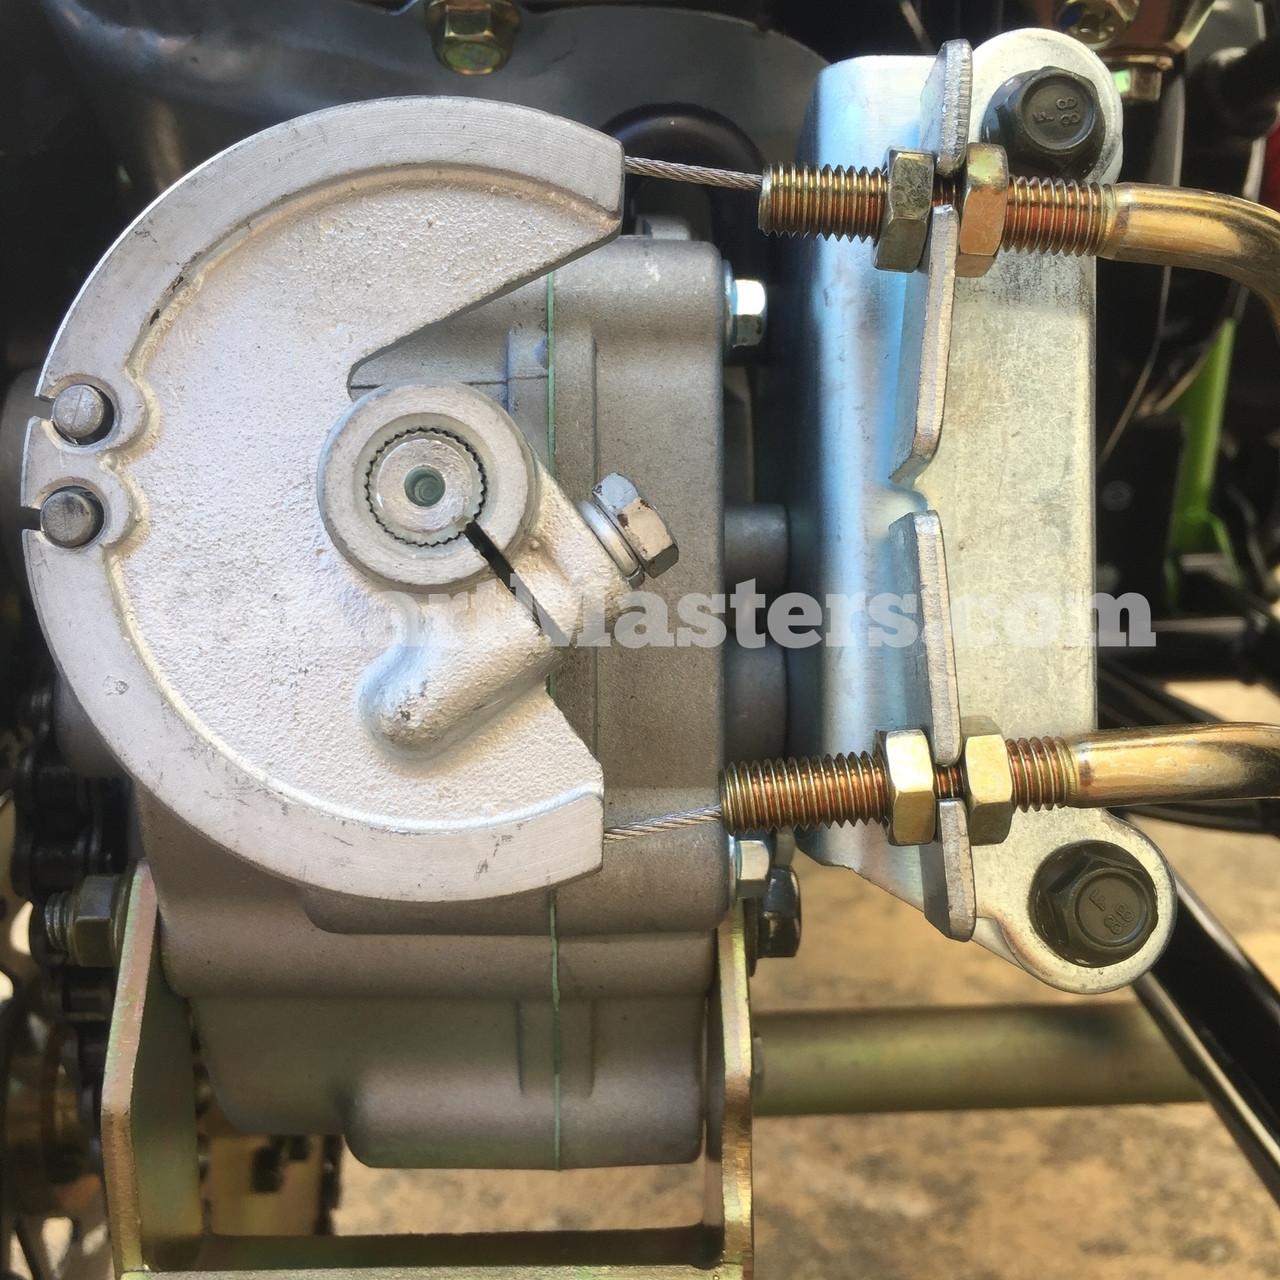 TrailMaster Mini XRX/R+ Go Kart - Reverse Gearbox